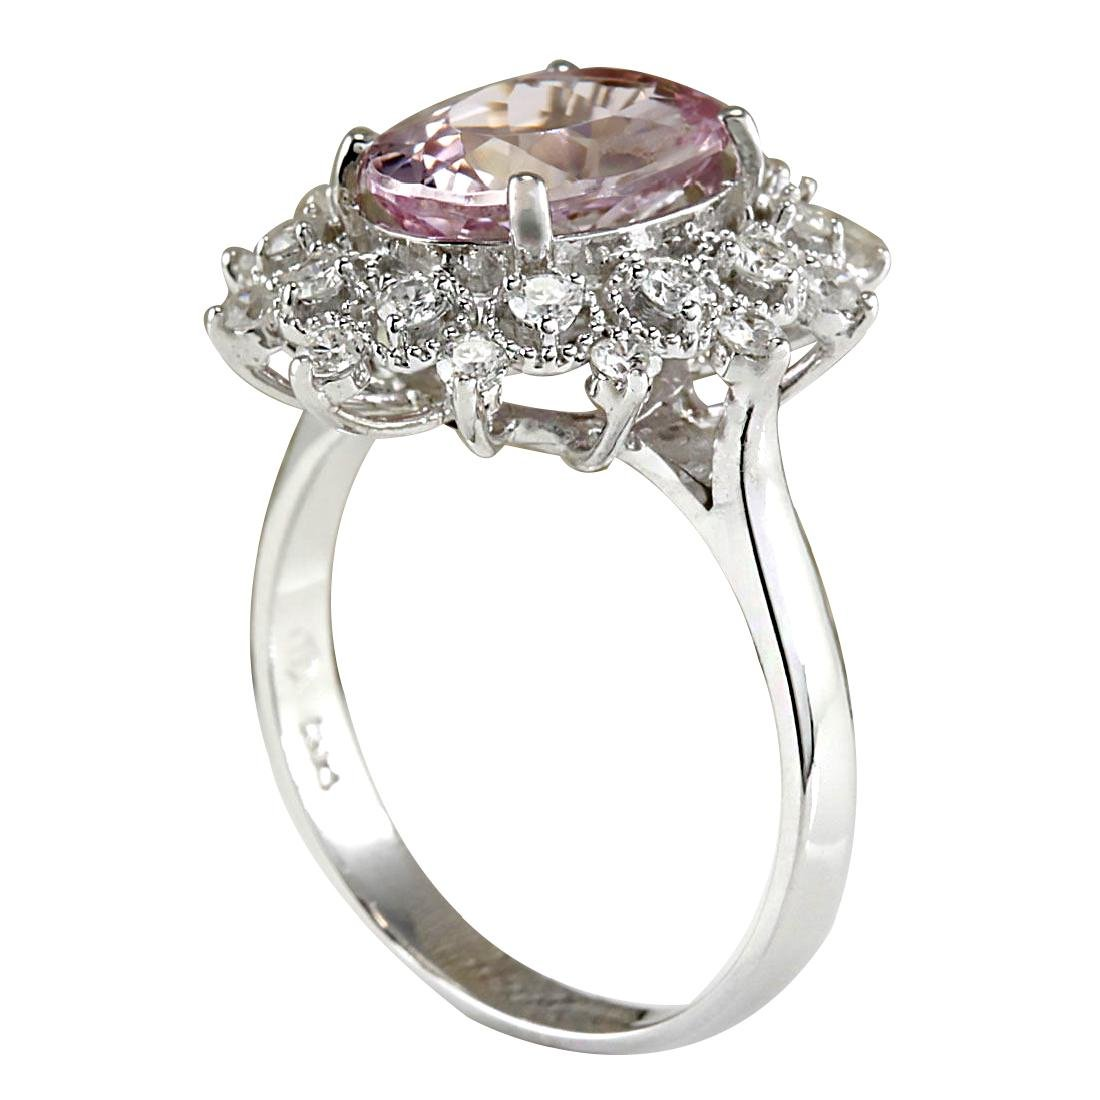 3.68CTW Natural Morganite And Diamond Ring In 18K White - 3